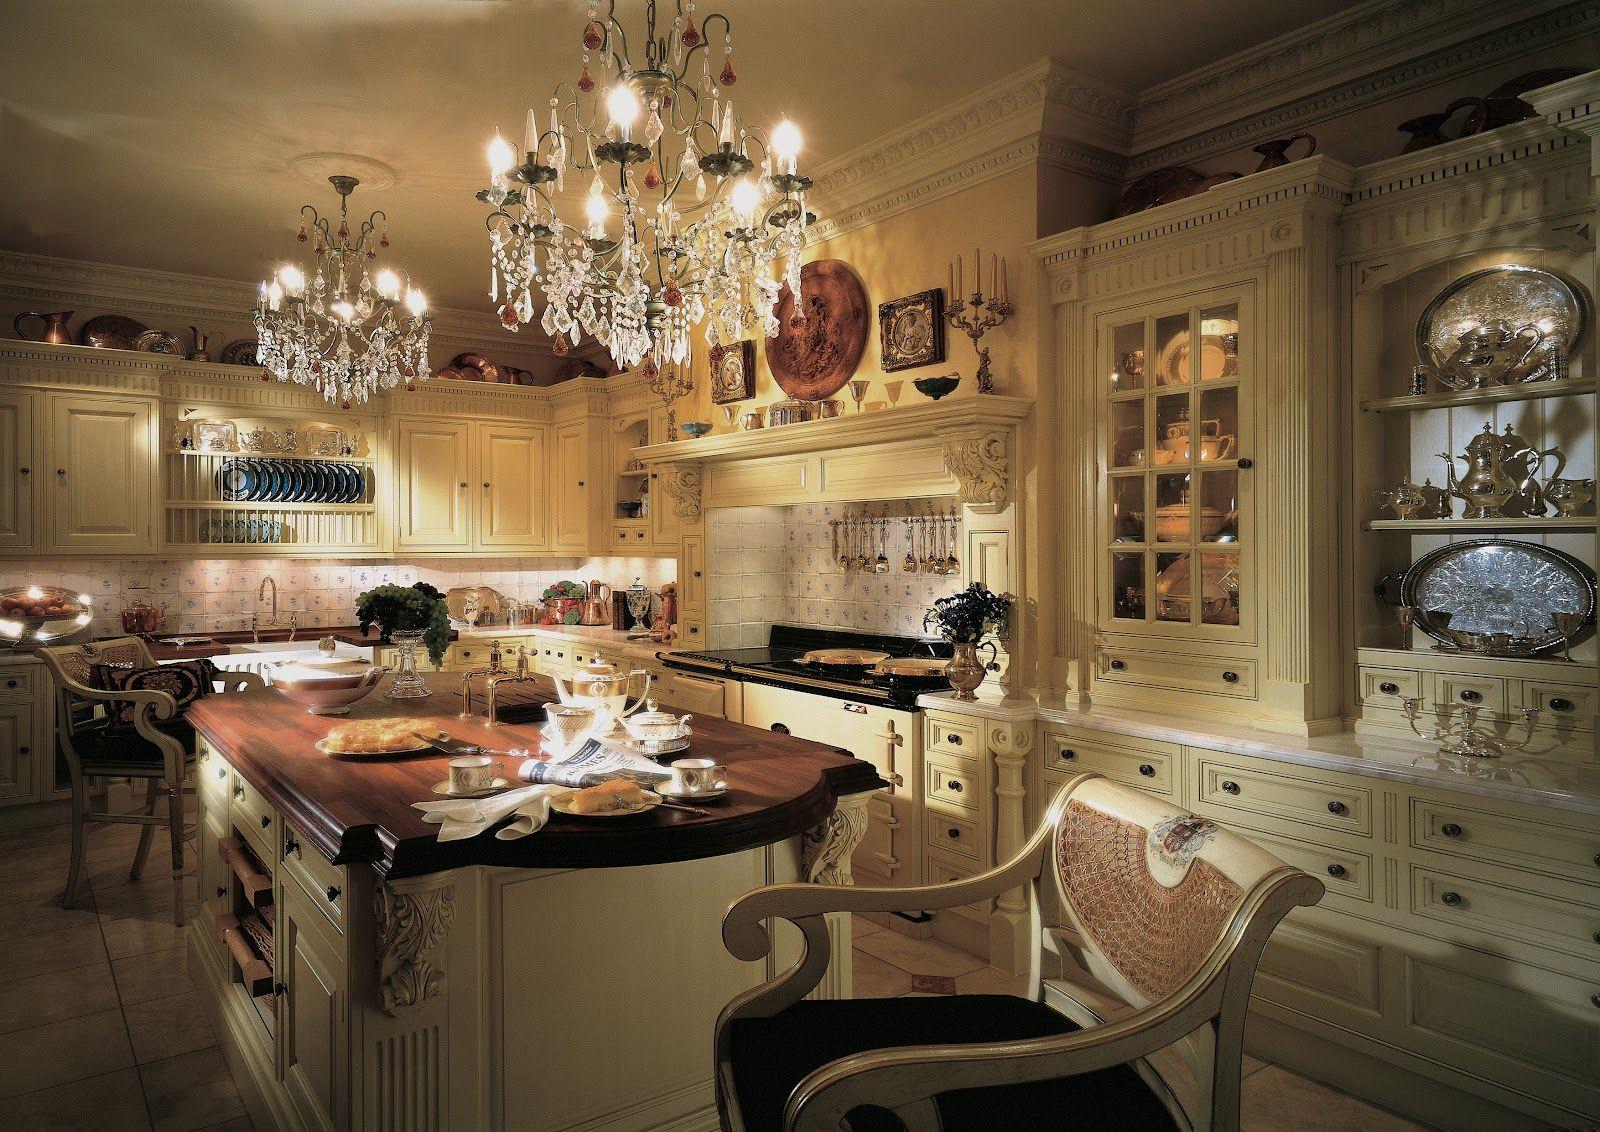 Classic Luxury Kitchen luxury kitchen sinks | victorian kitchen | best house ideas